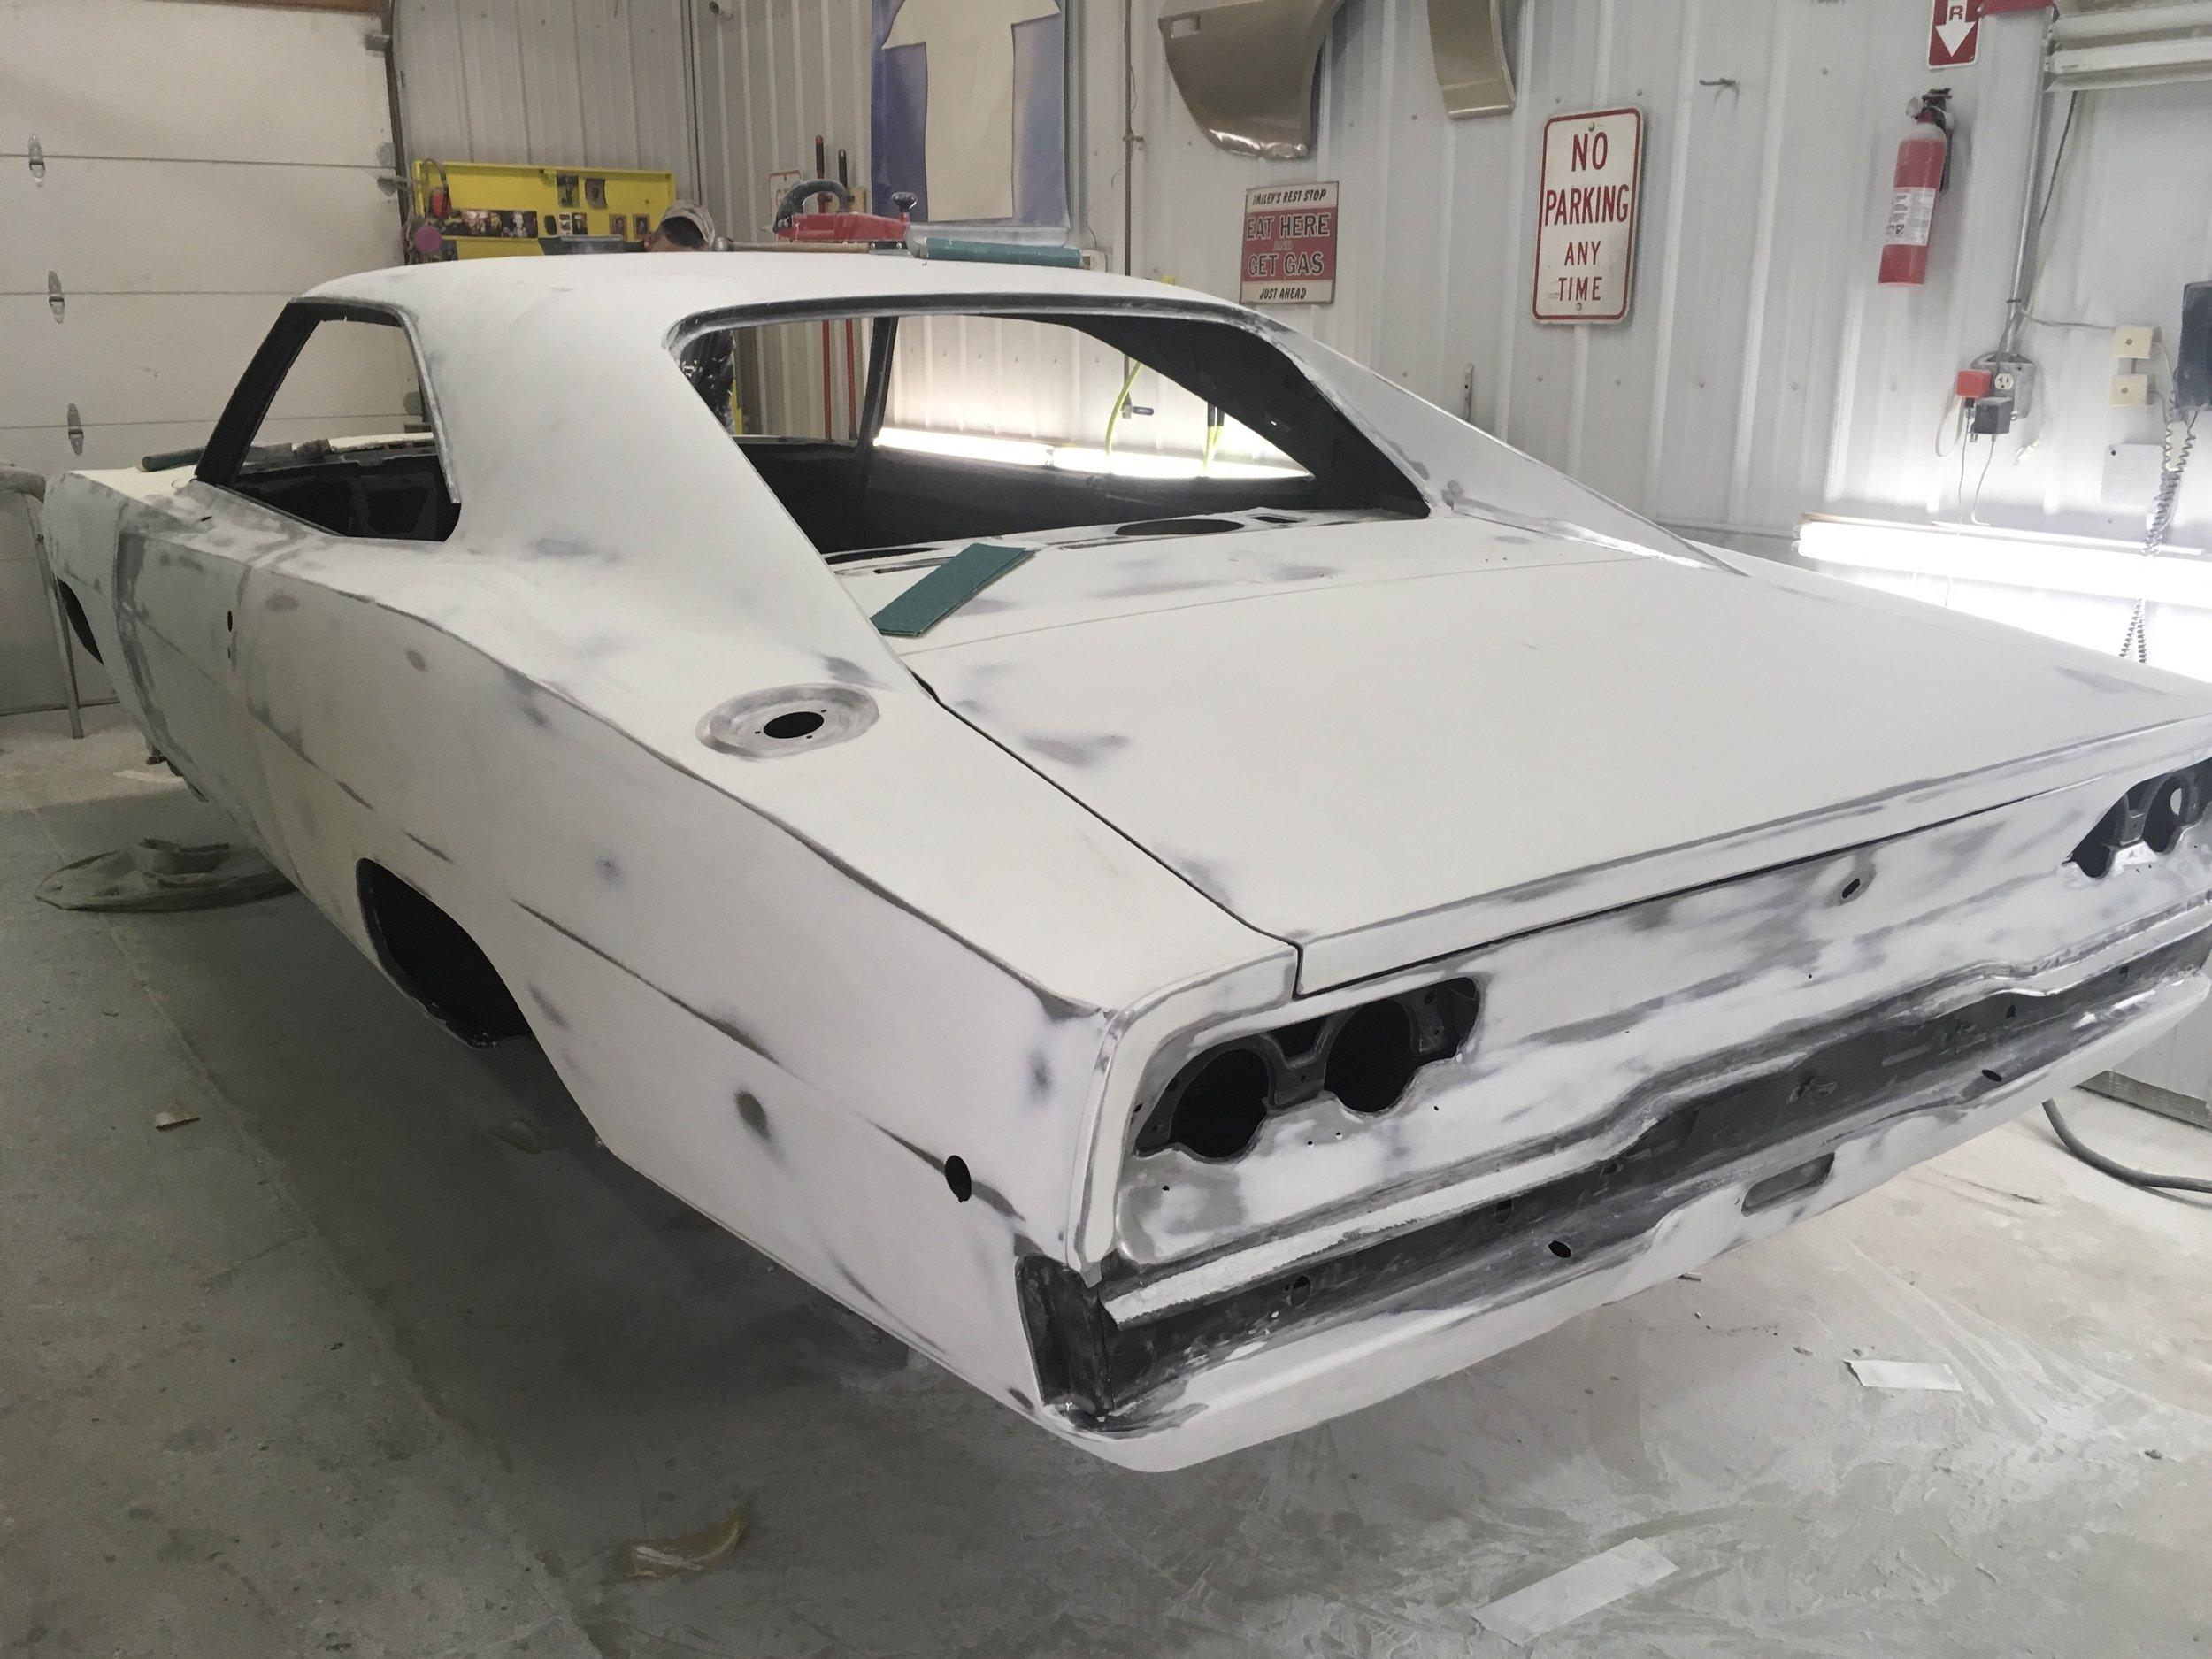 1968-Hell-Cat-Charger-minneapolis-hot-rod-custom-build-restoration-14.jpg